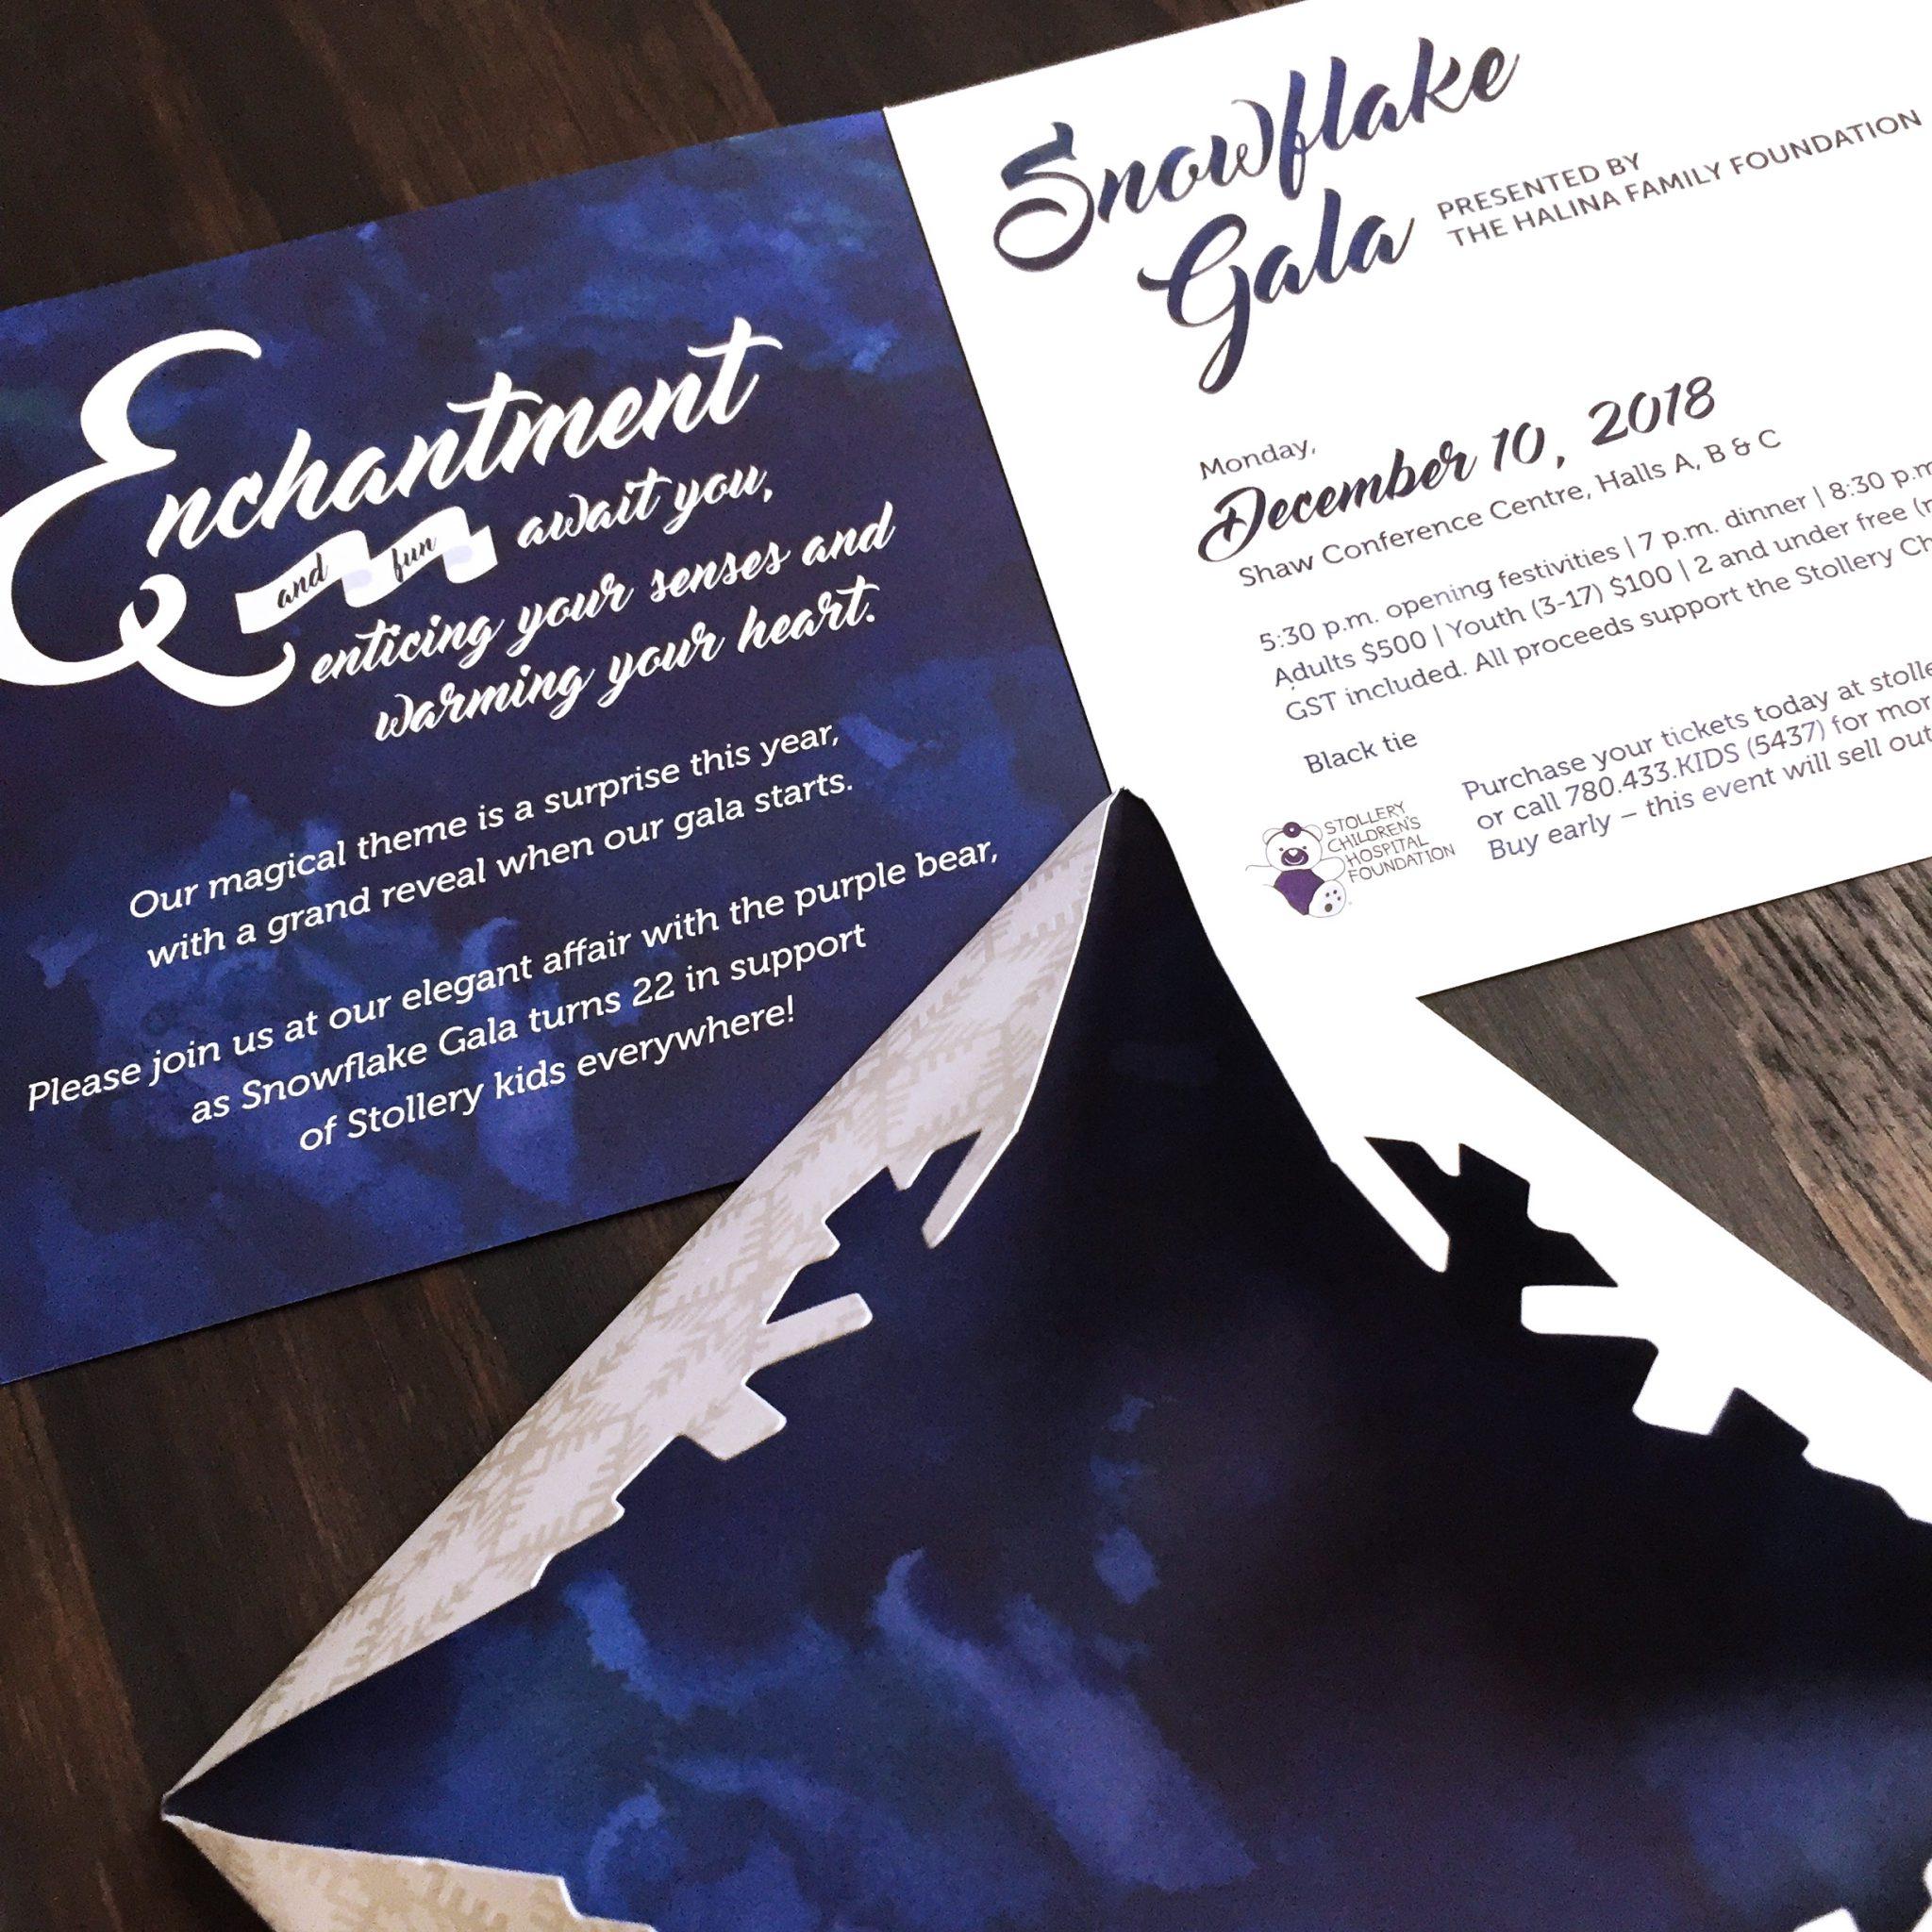 Stollery Snowflake Gala Invitation